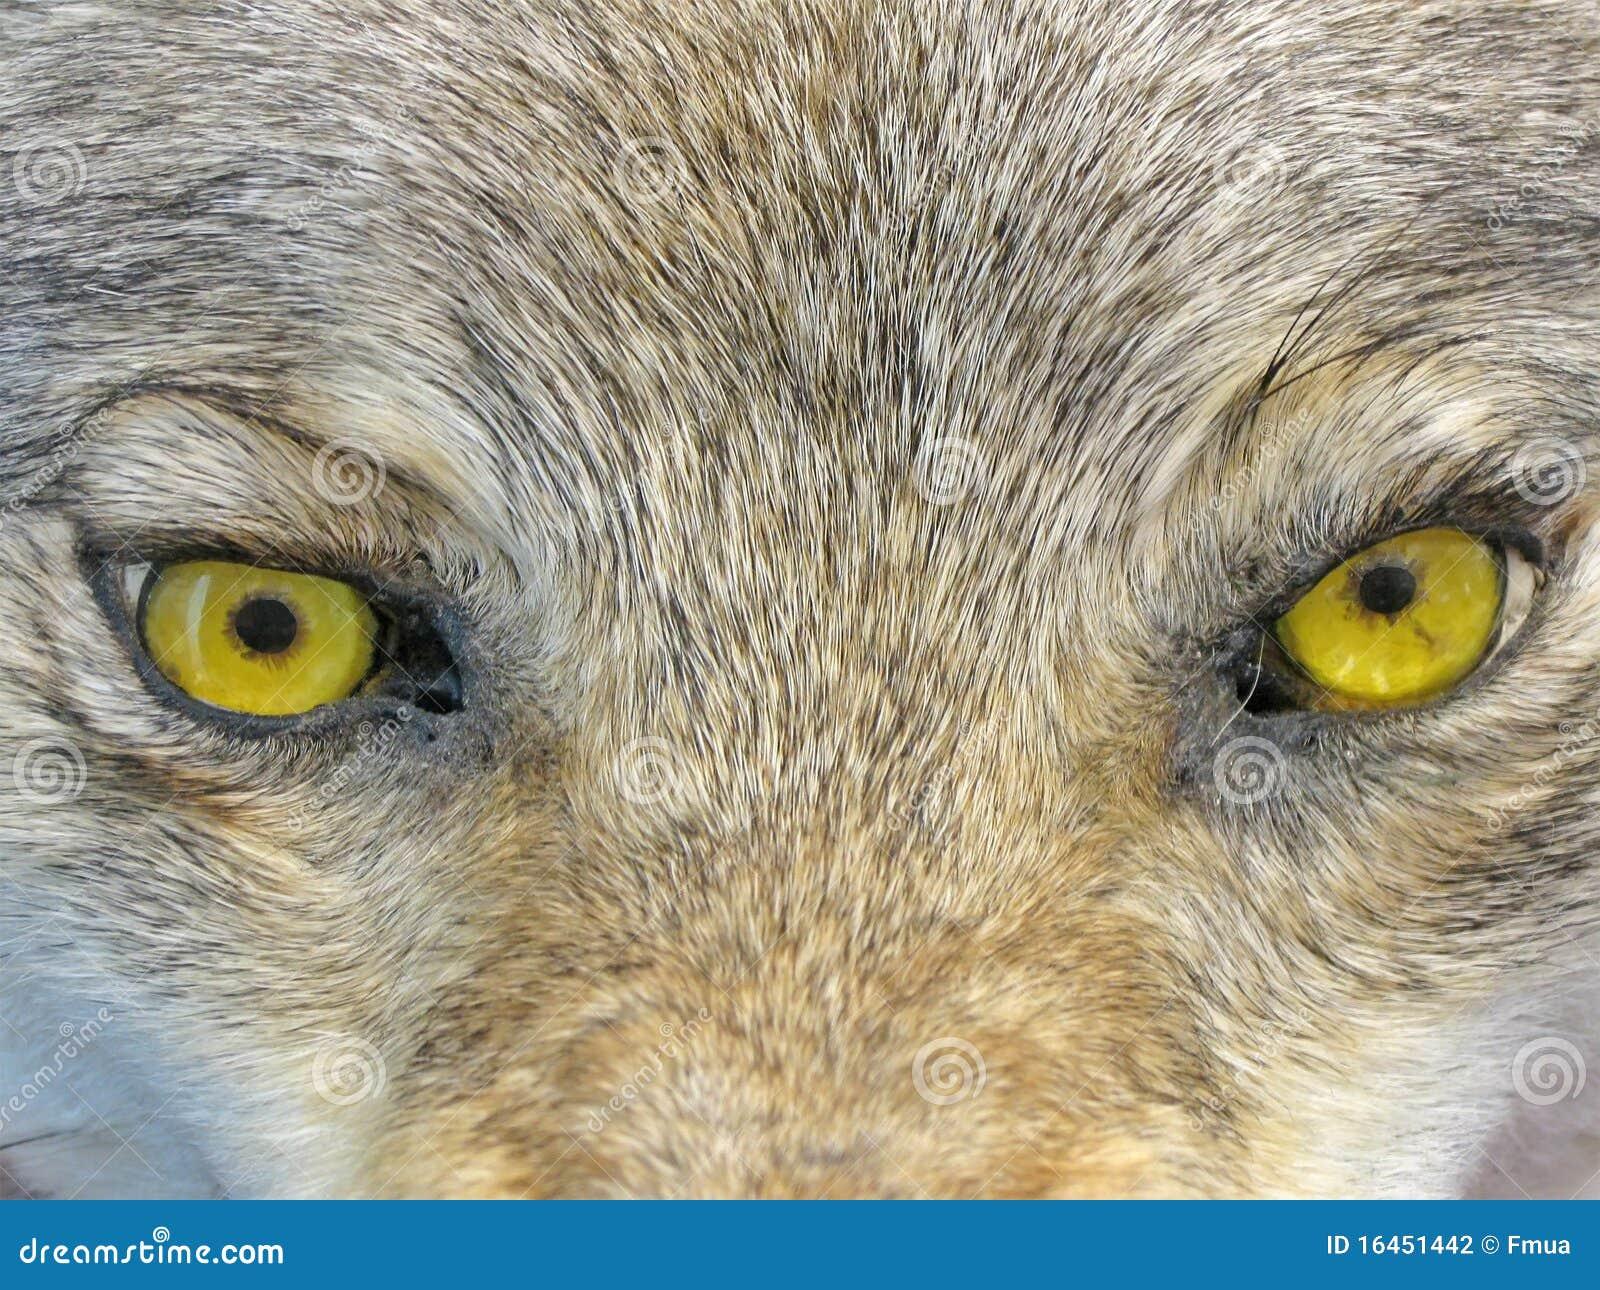 yeux jaunes de loup nature animale sauvage photographie stock image 16451442. Black Bedroom Furniture Sets. Home Design Ideas